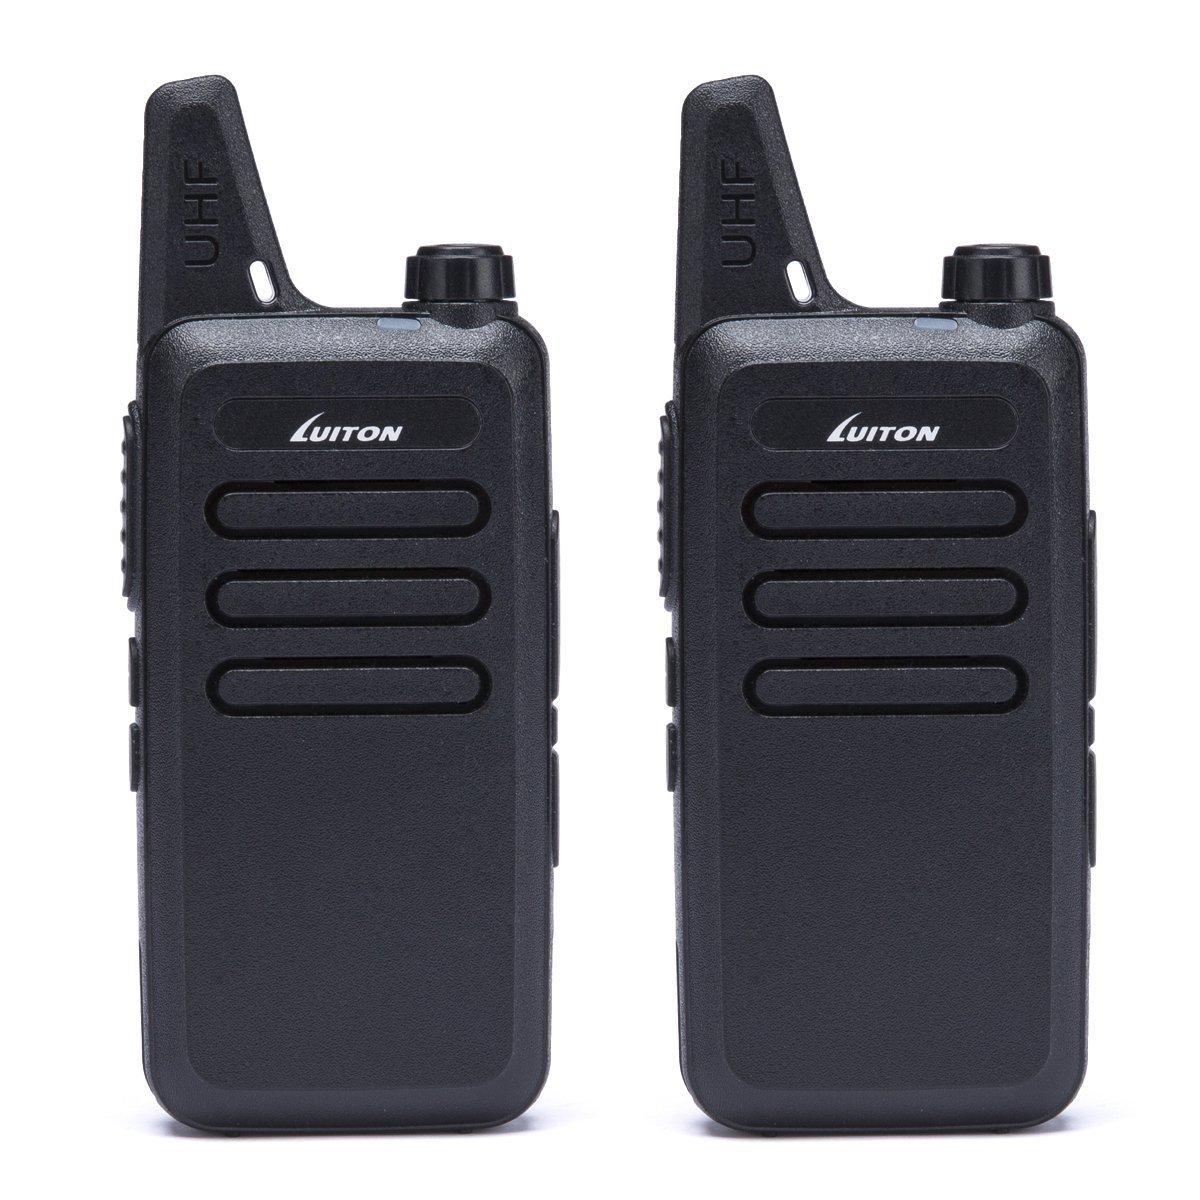 LUITON UHF Walkie Talkies Car Electronics Two-Way Radios For Car Rechargeable Long Range Outdoor Hiking Hunting UHF Walkie Talkies USB Charging Amateur Two Way Radio LT-316 Black (1 Pair)